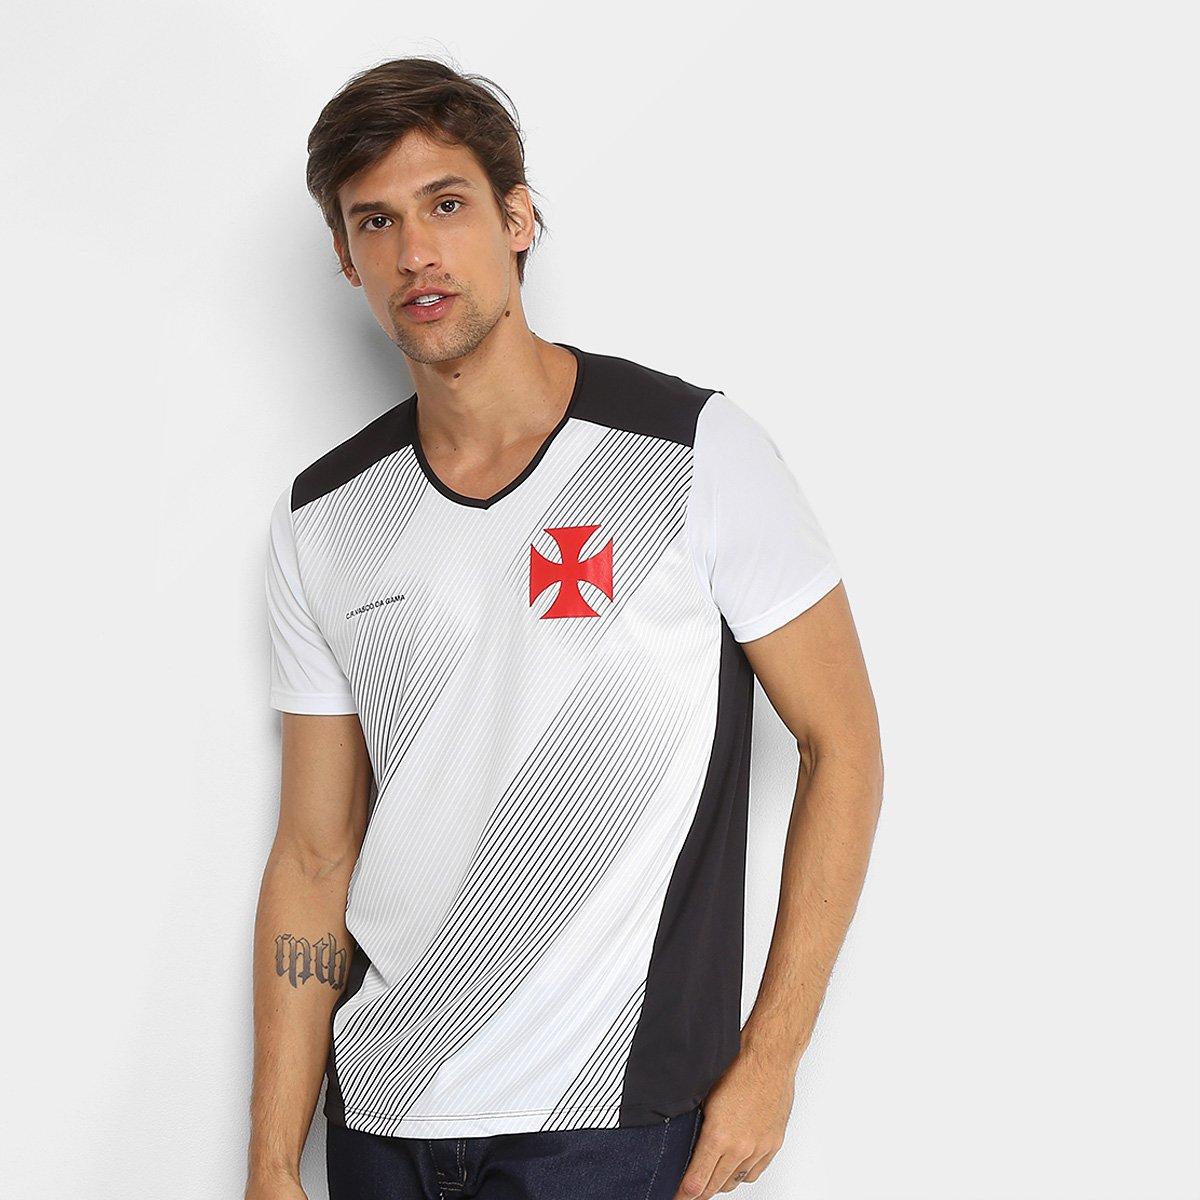 b1237c1f48 Camiseta Vasco Better Masculina - Compre Agora